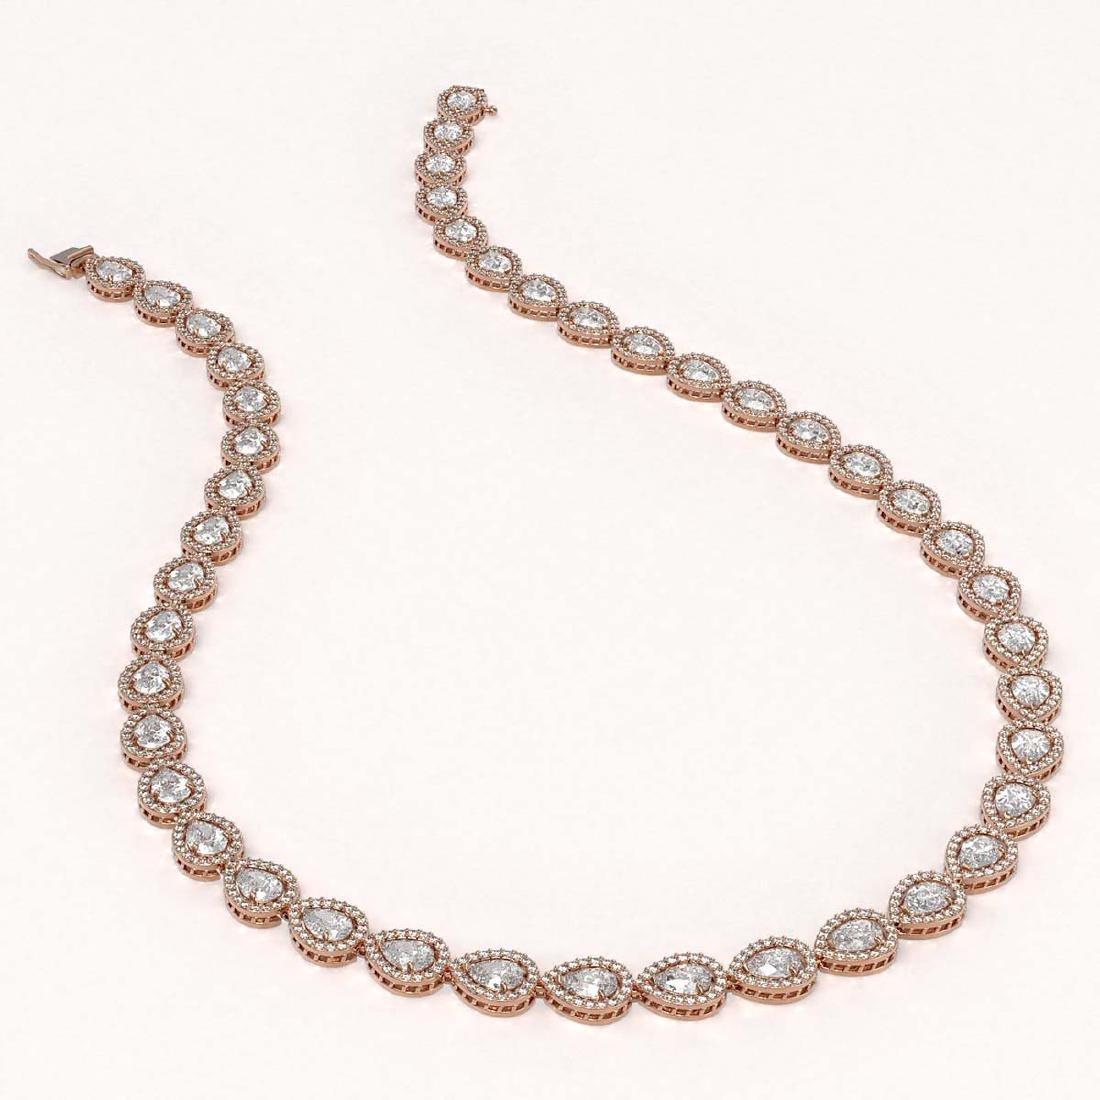 33.08 CTW Pear Diamond Designer Necklace 18K Rose Gold - 2